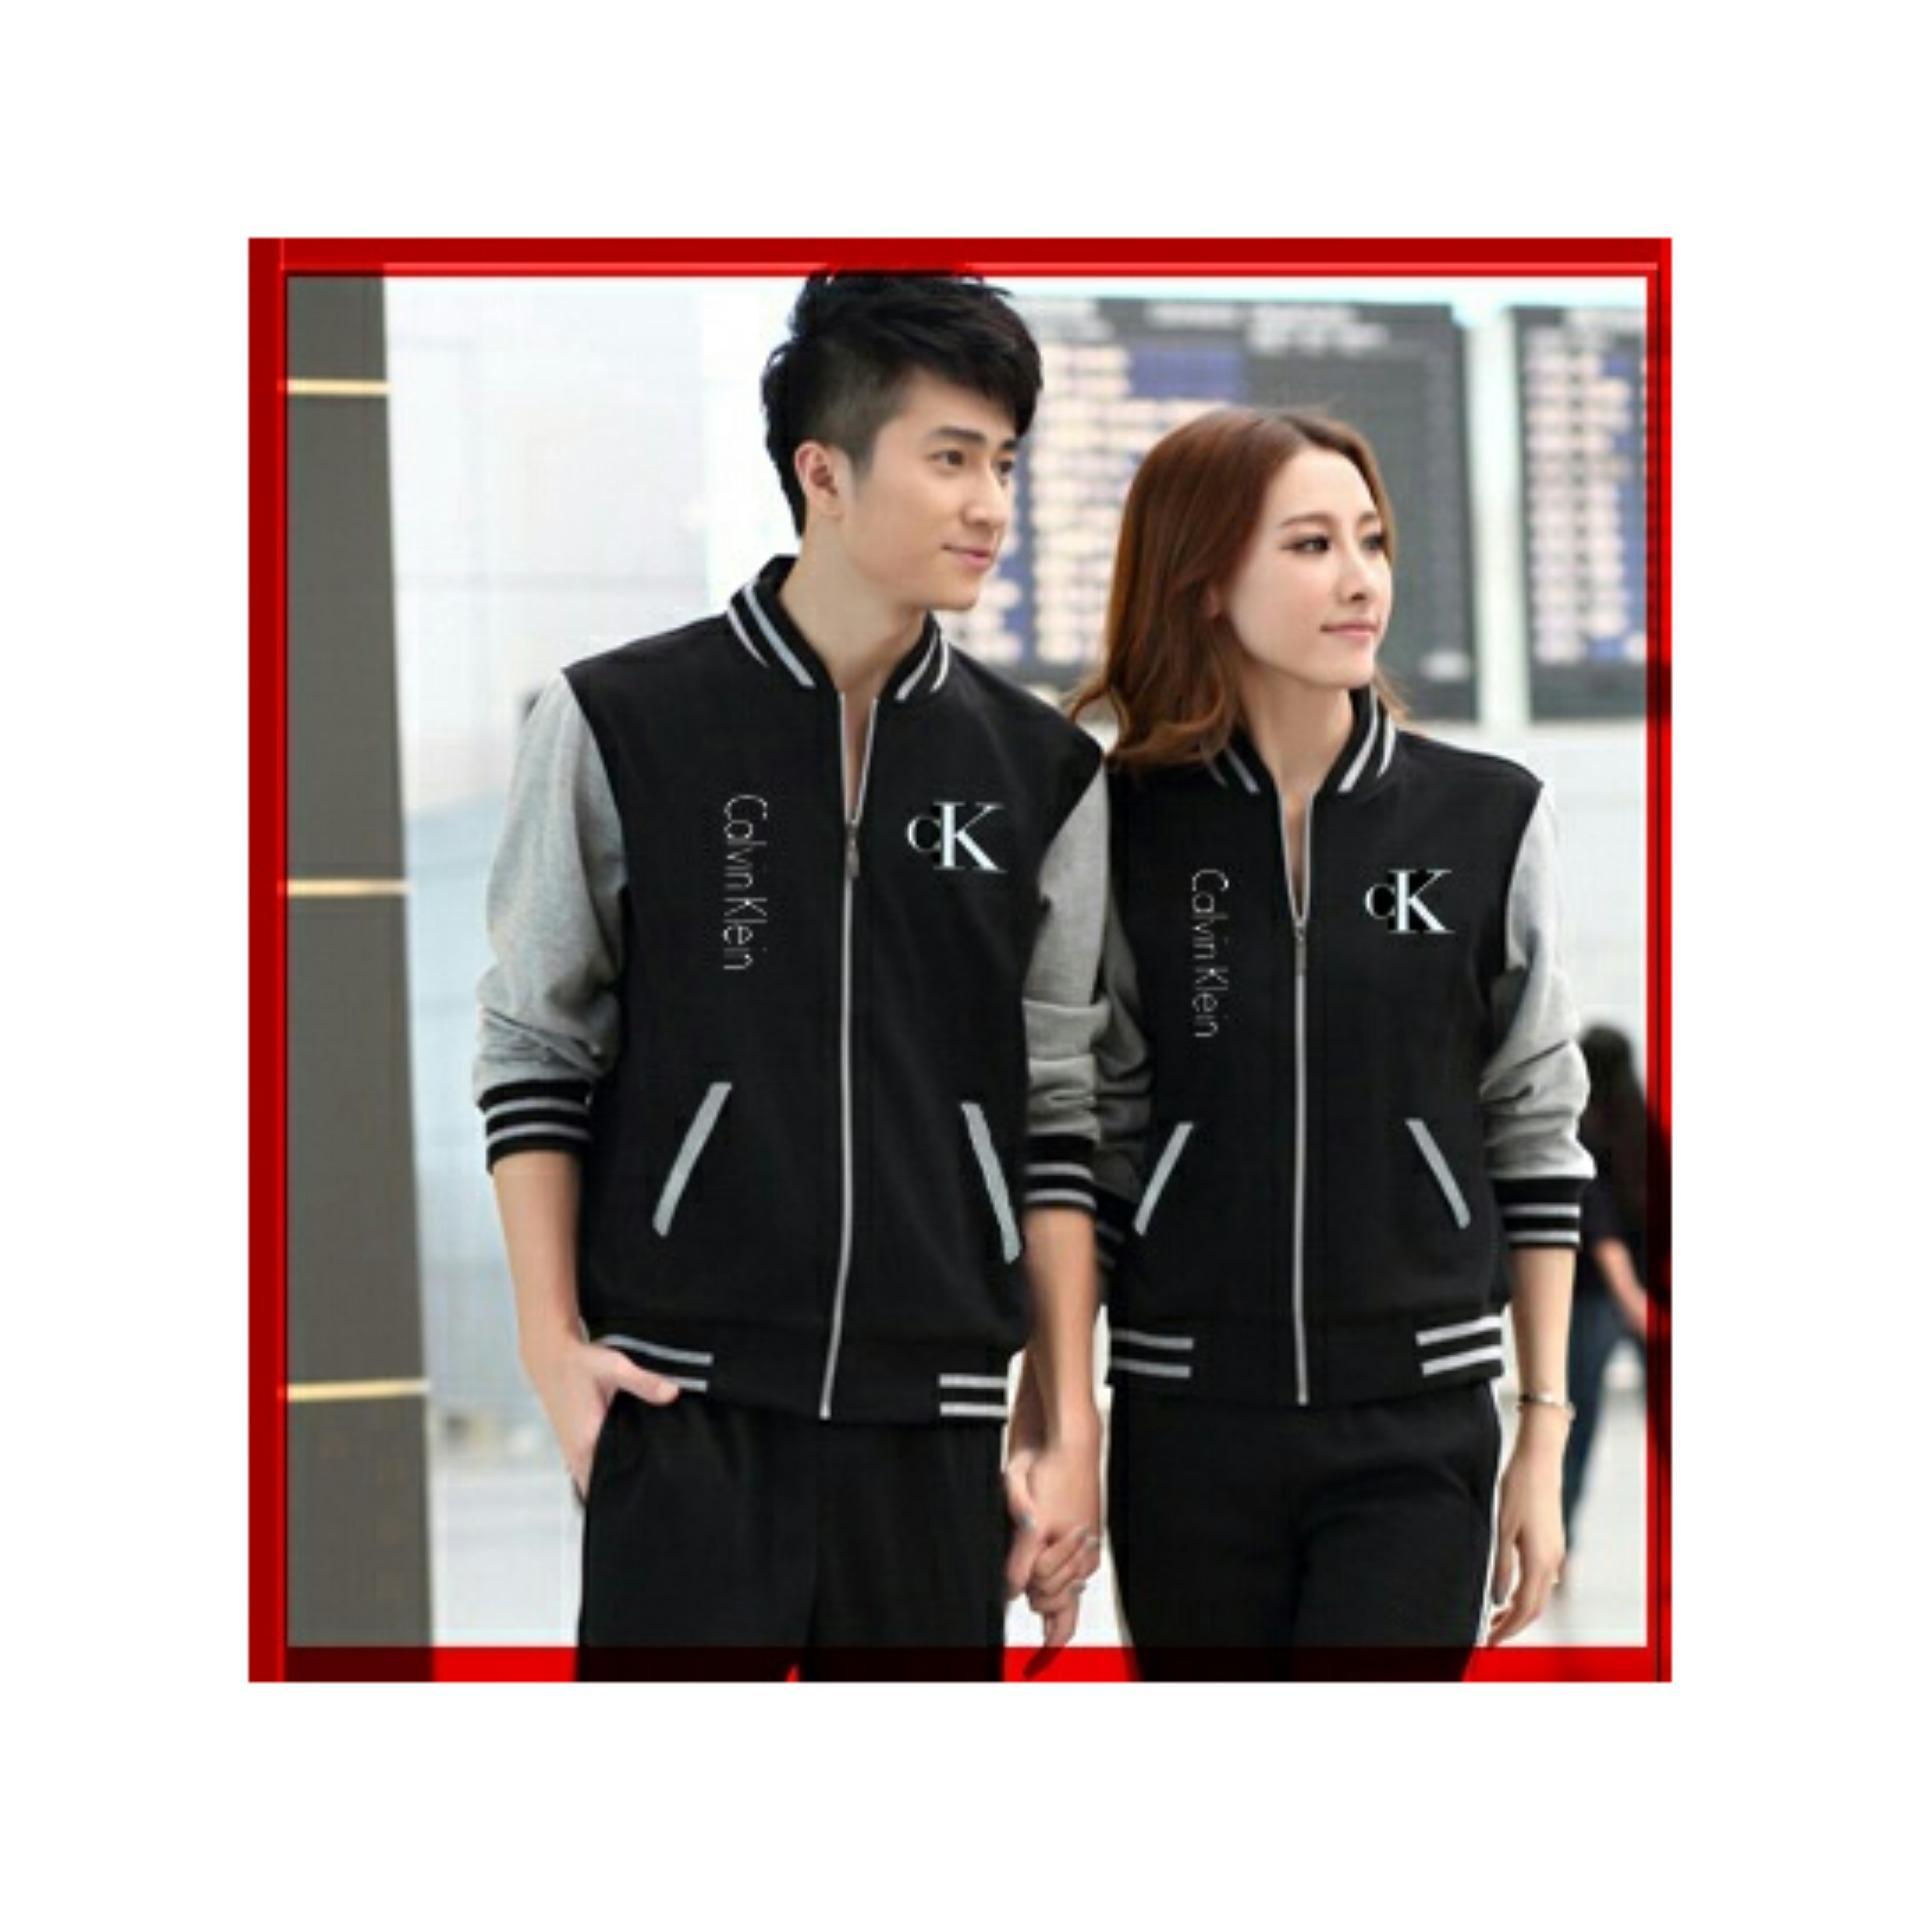 DeCouple Jaket Baru Pasangan Wanita dan Pria CK   Jacket Couple Calvin   Jaket  Sepasang   979da131fa